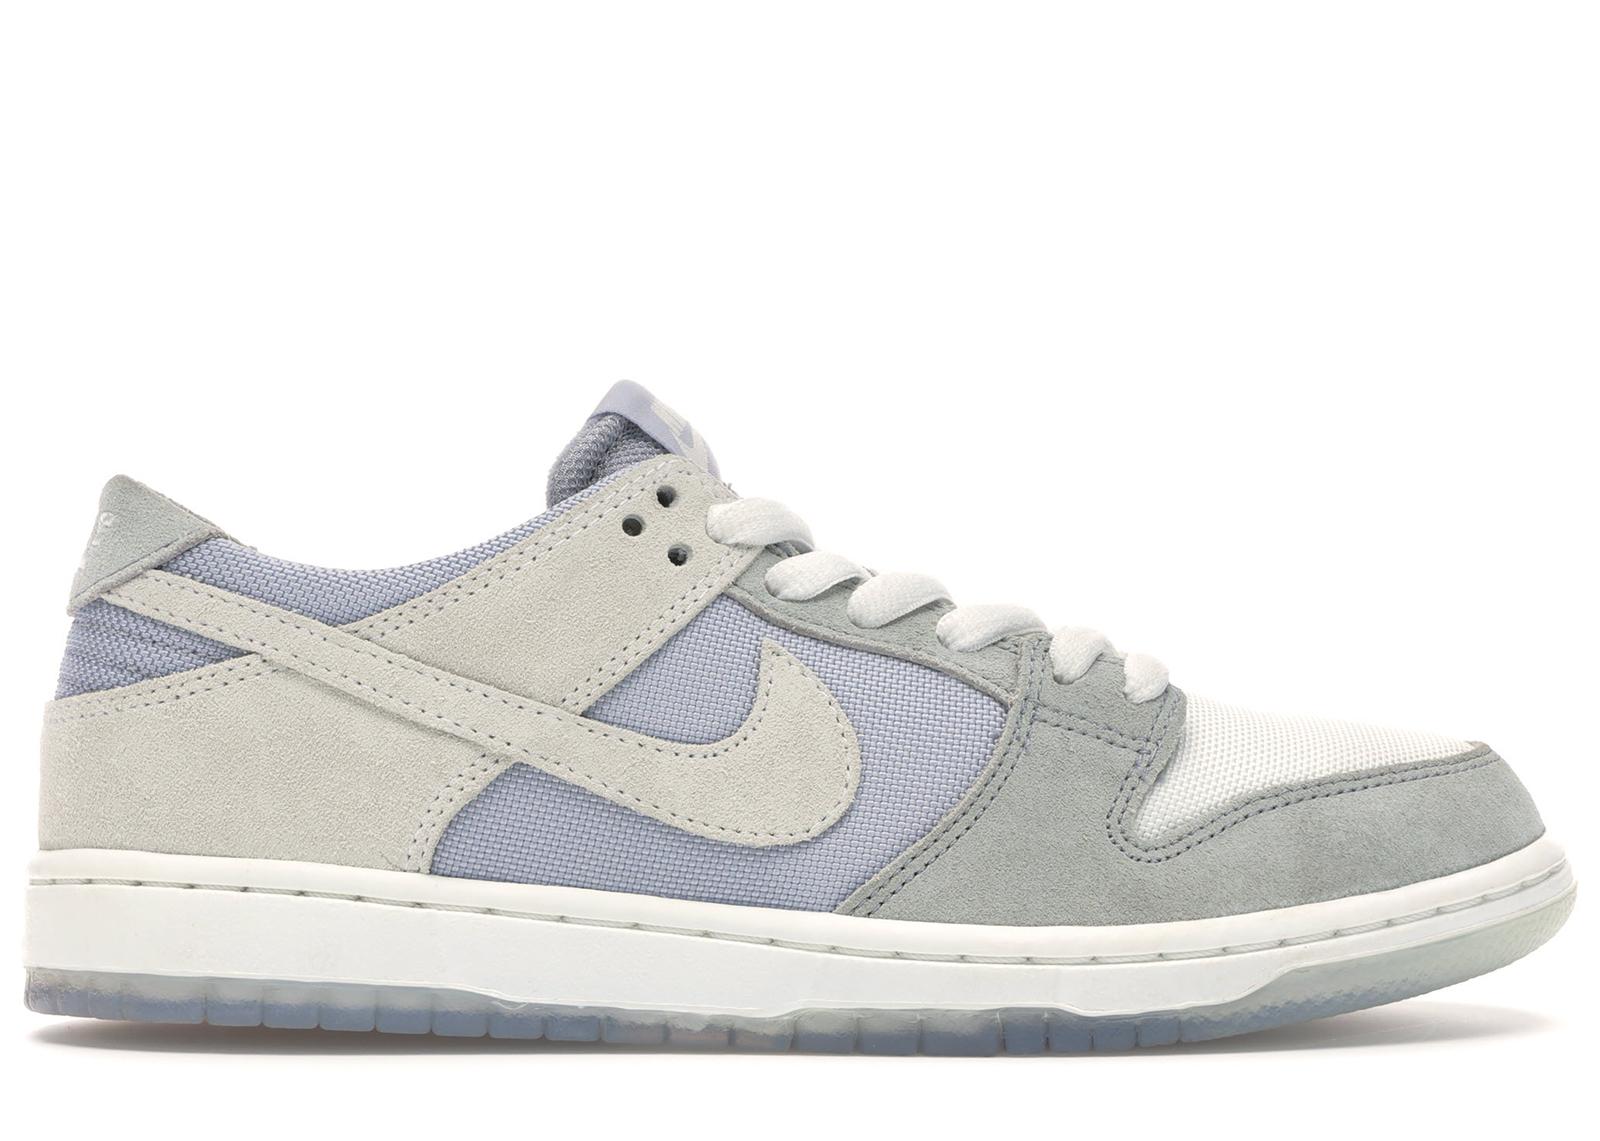 Nike SB Dunk Low Wolf Grey - 854866-011